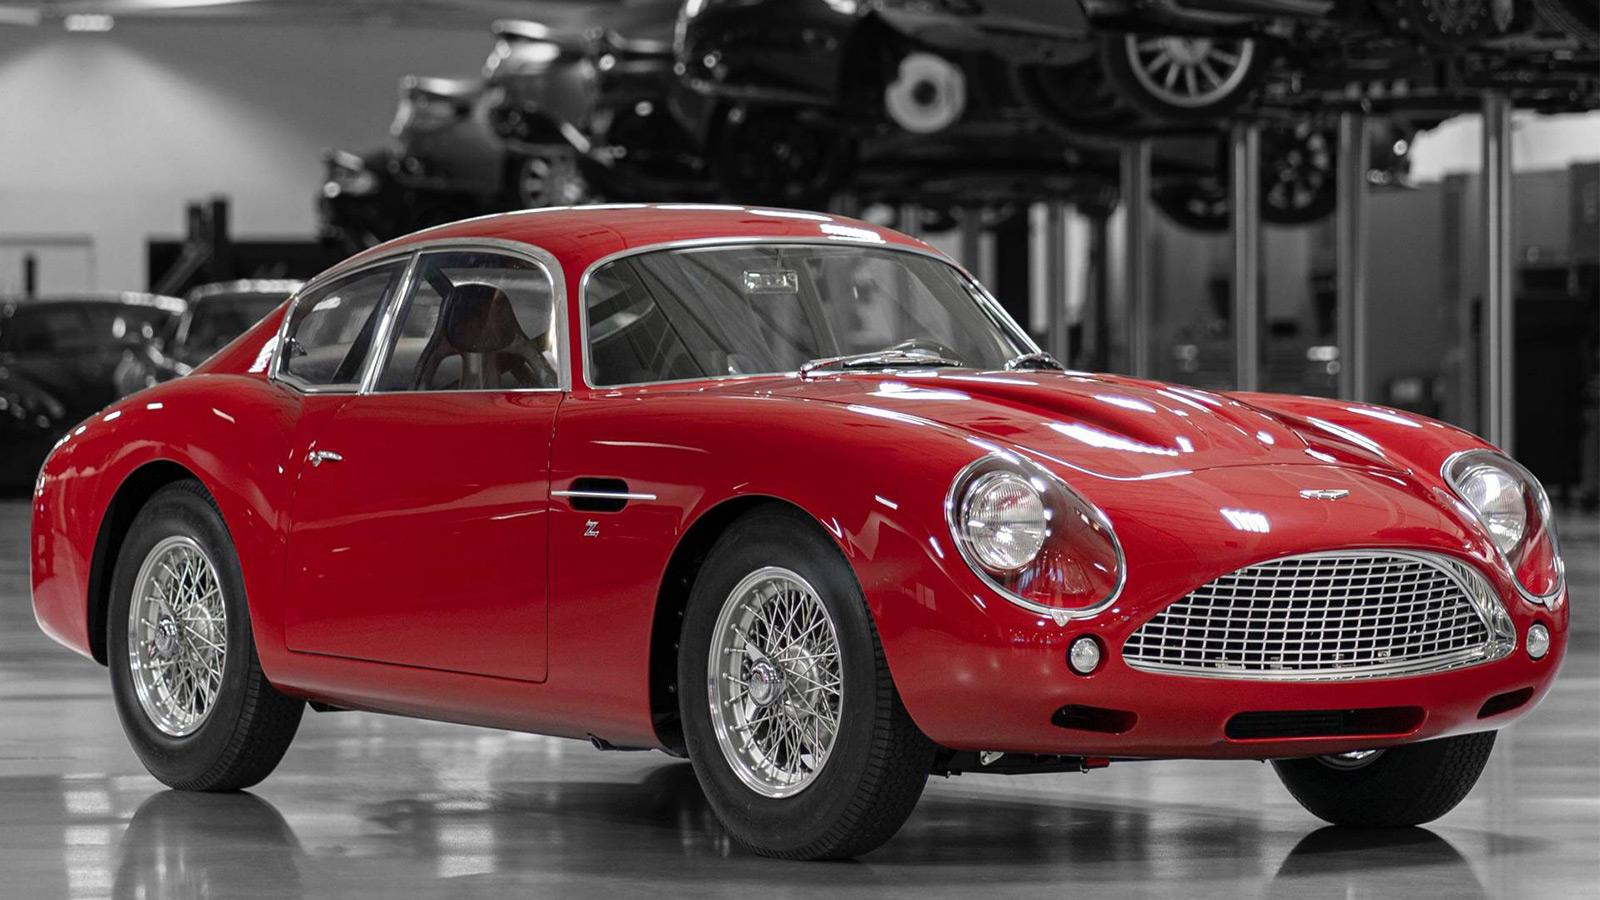 Aston Martin Db4 Gt Zagato Continuation Imboldn